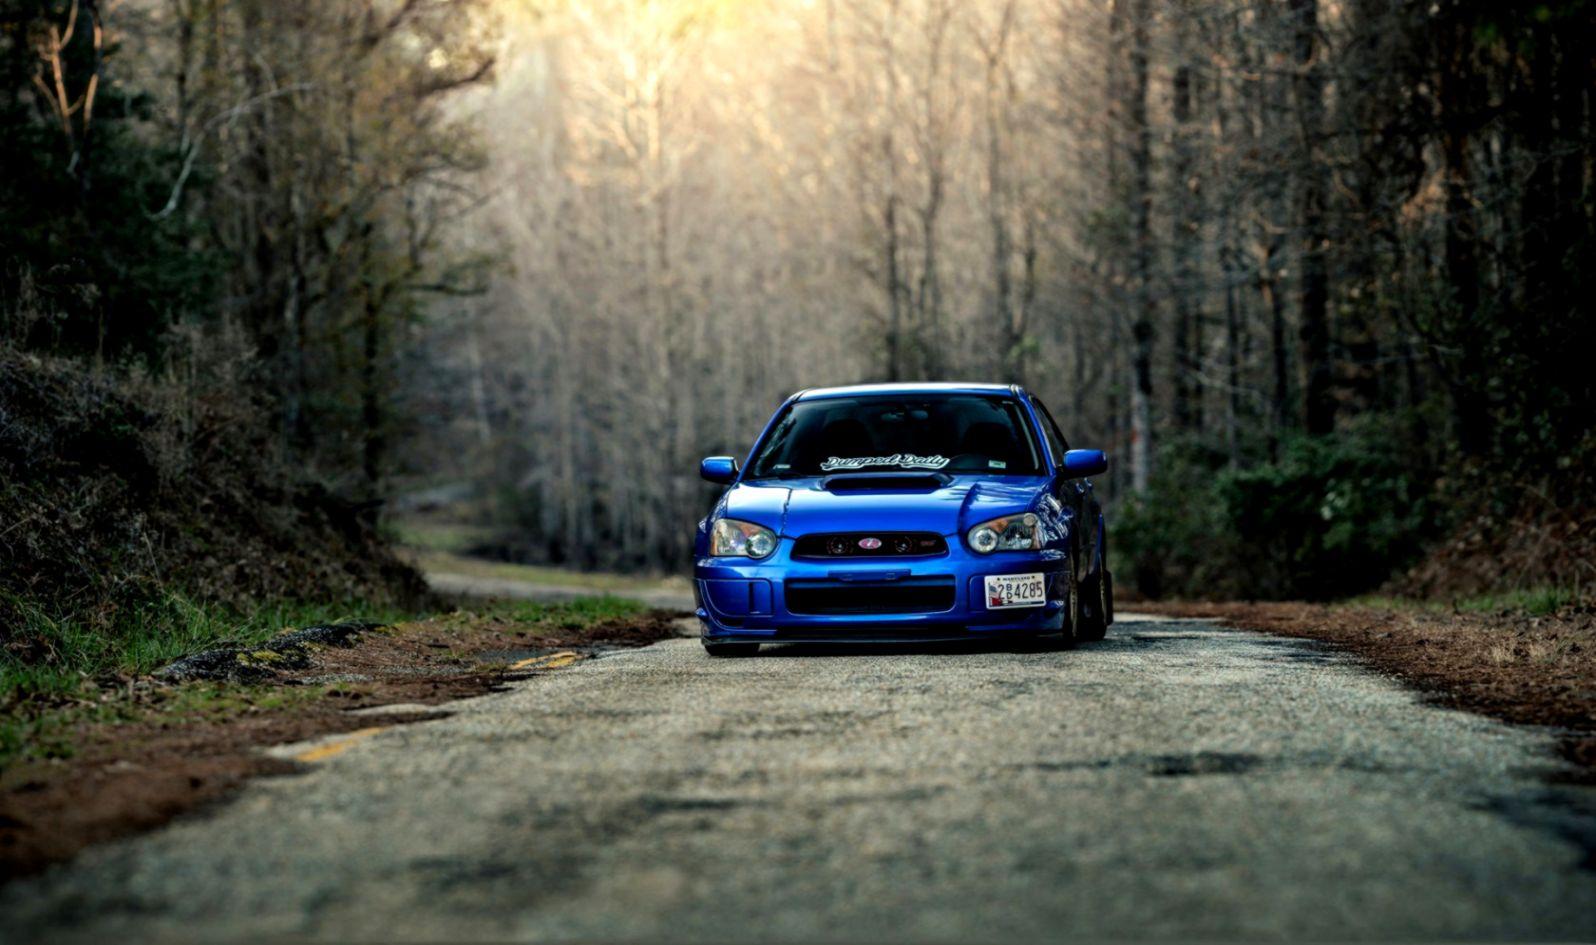 Cars Tuning Subaru Impreza Wrx Jdm Wallpaper: Subaru Impreza Wrx Sti Tuning Car Hd Wallpaper